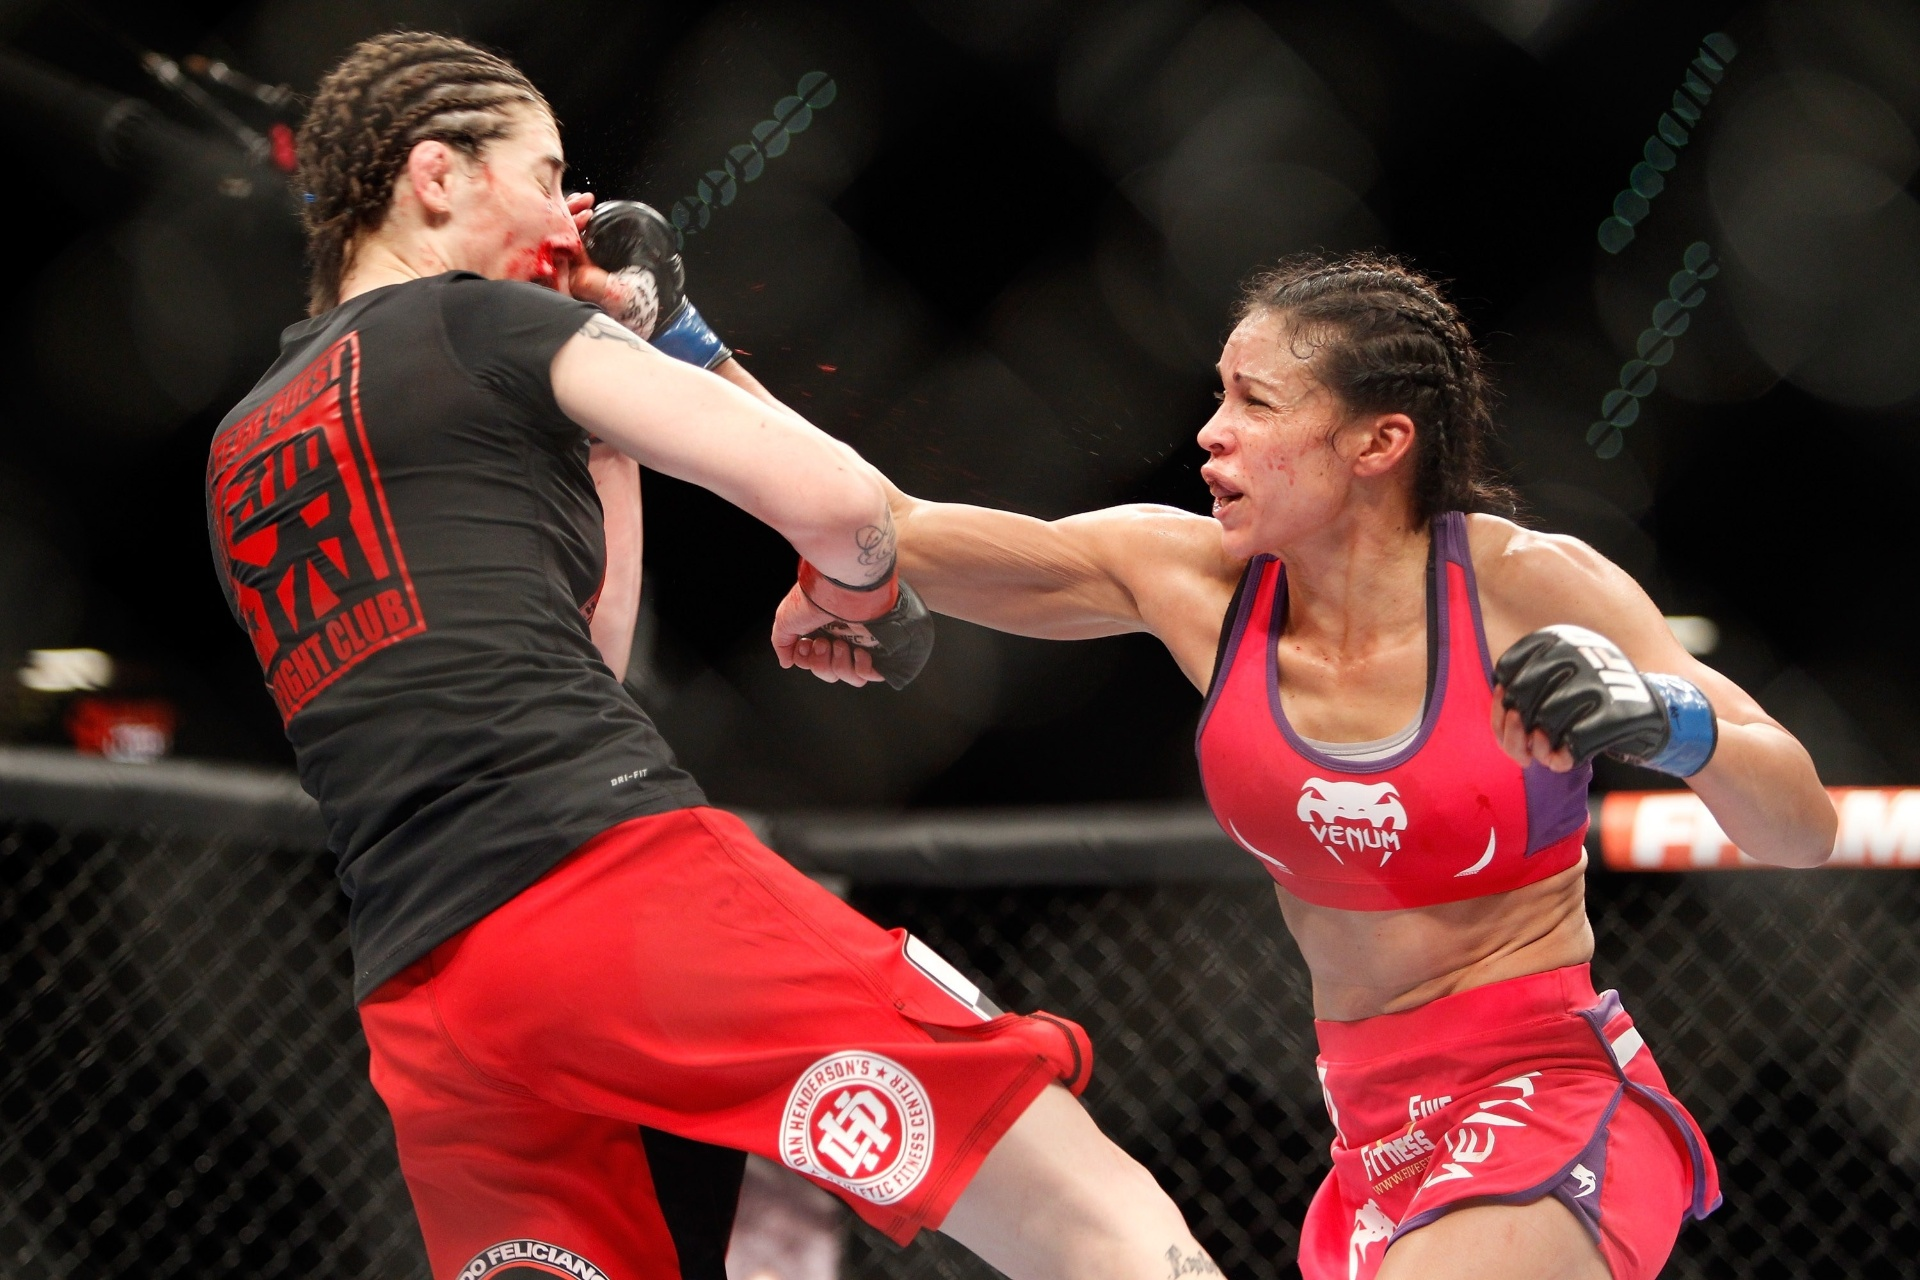 Marion Reneau castiga Alexis Dufresne na primeira luta do card preliminar do UFC 182.